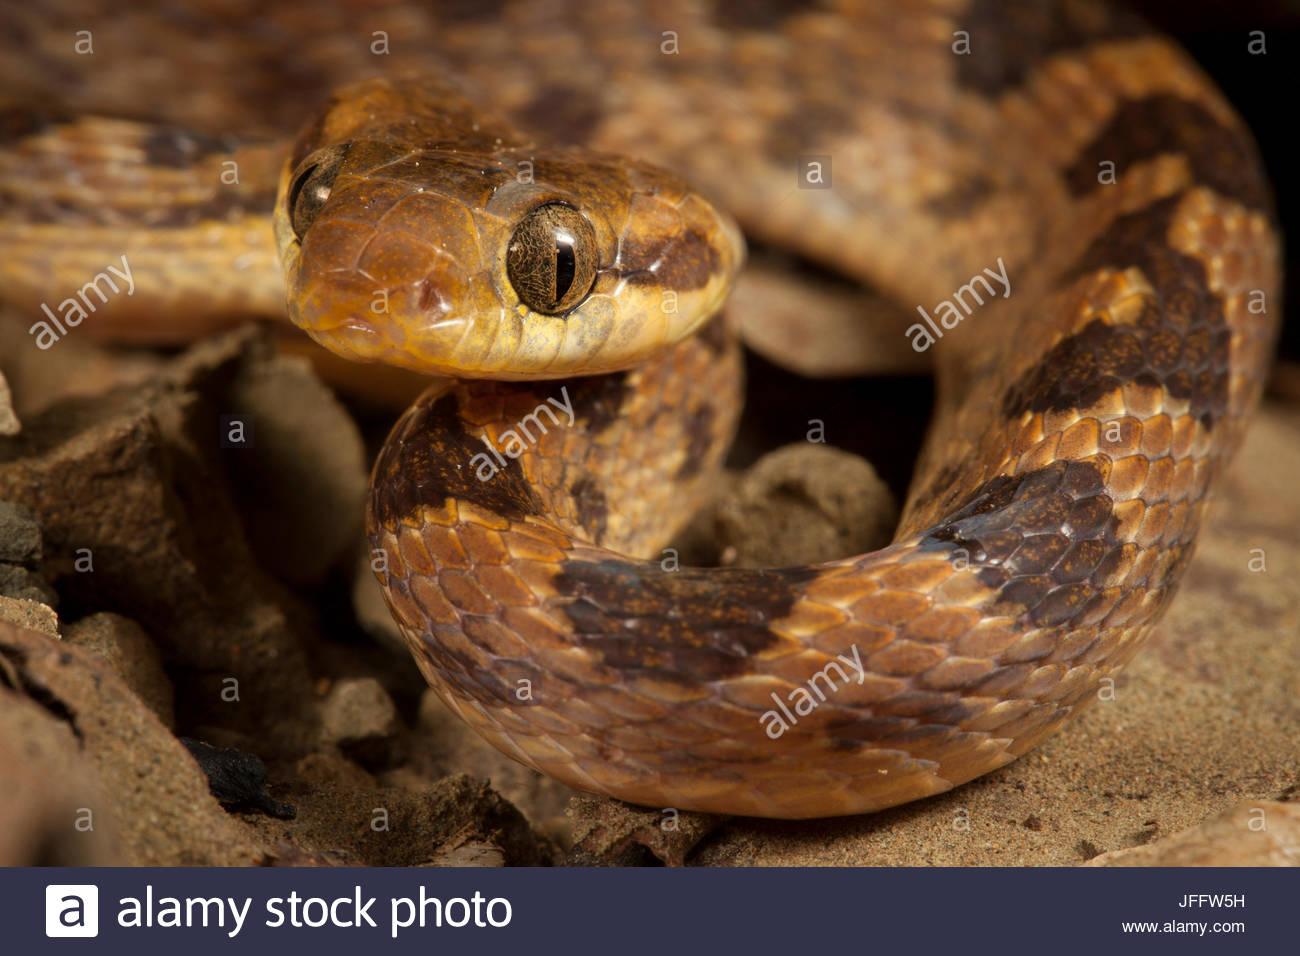 Close up portrait of a northern cat-eyed snake, Leptodeira septentrionalis. - Stock Image